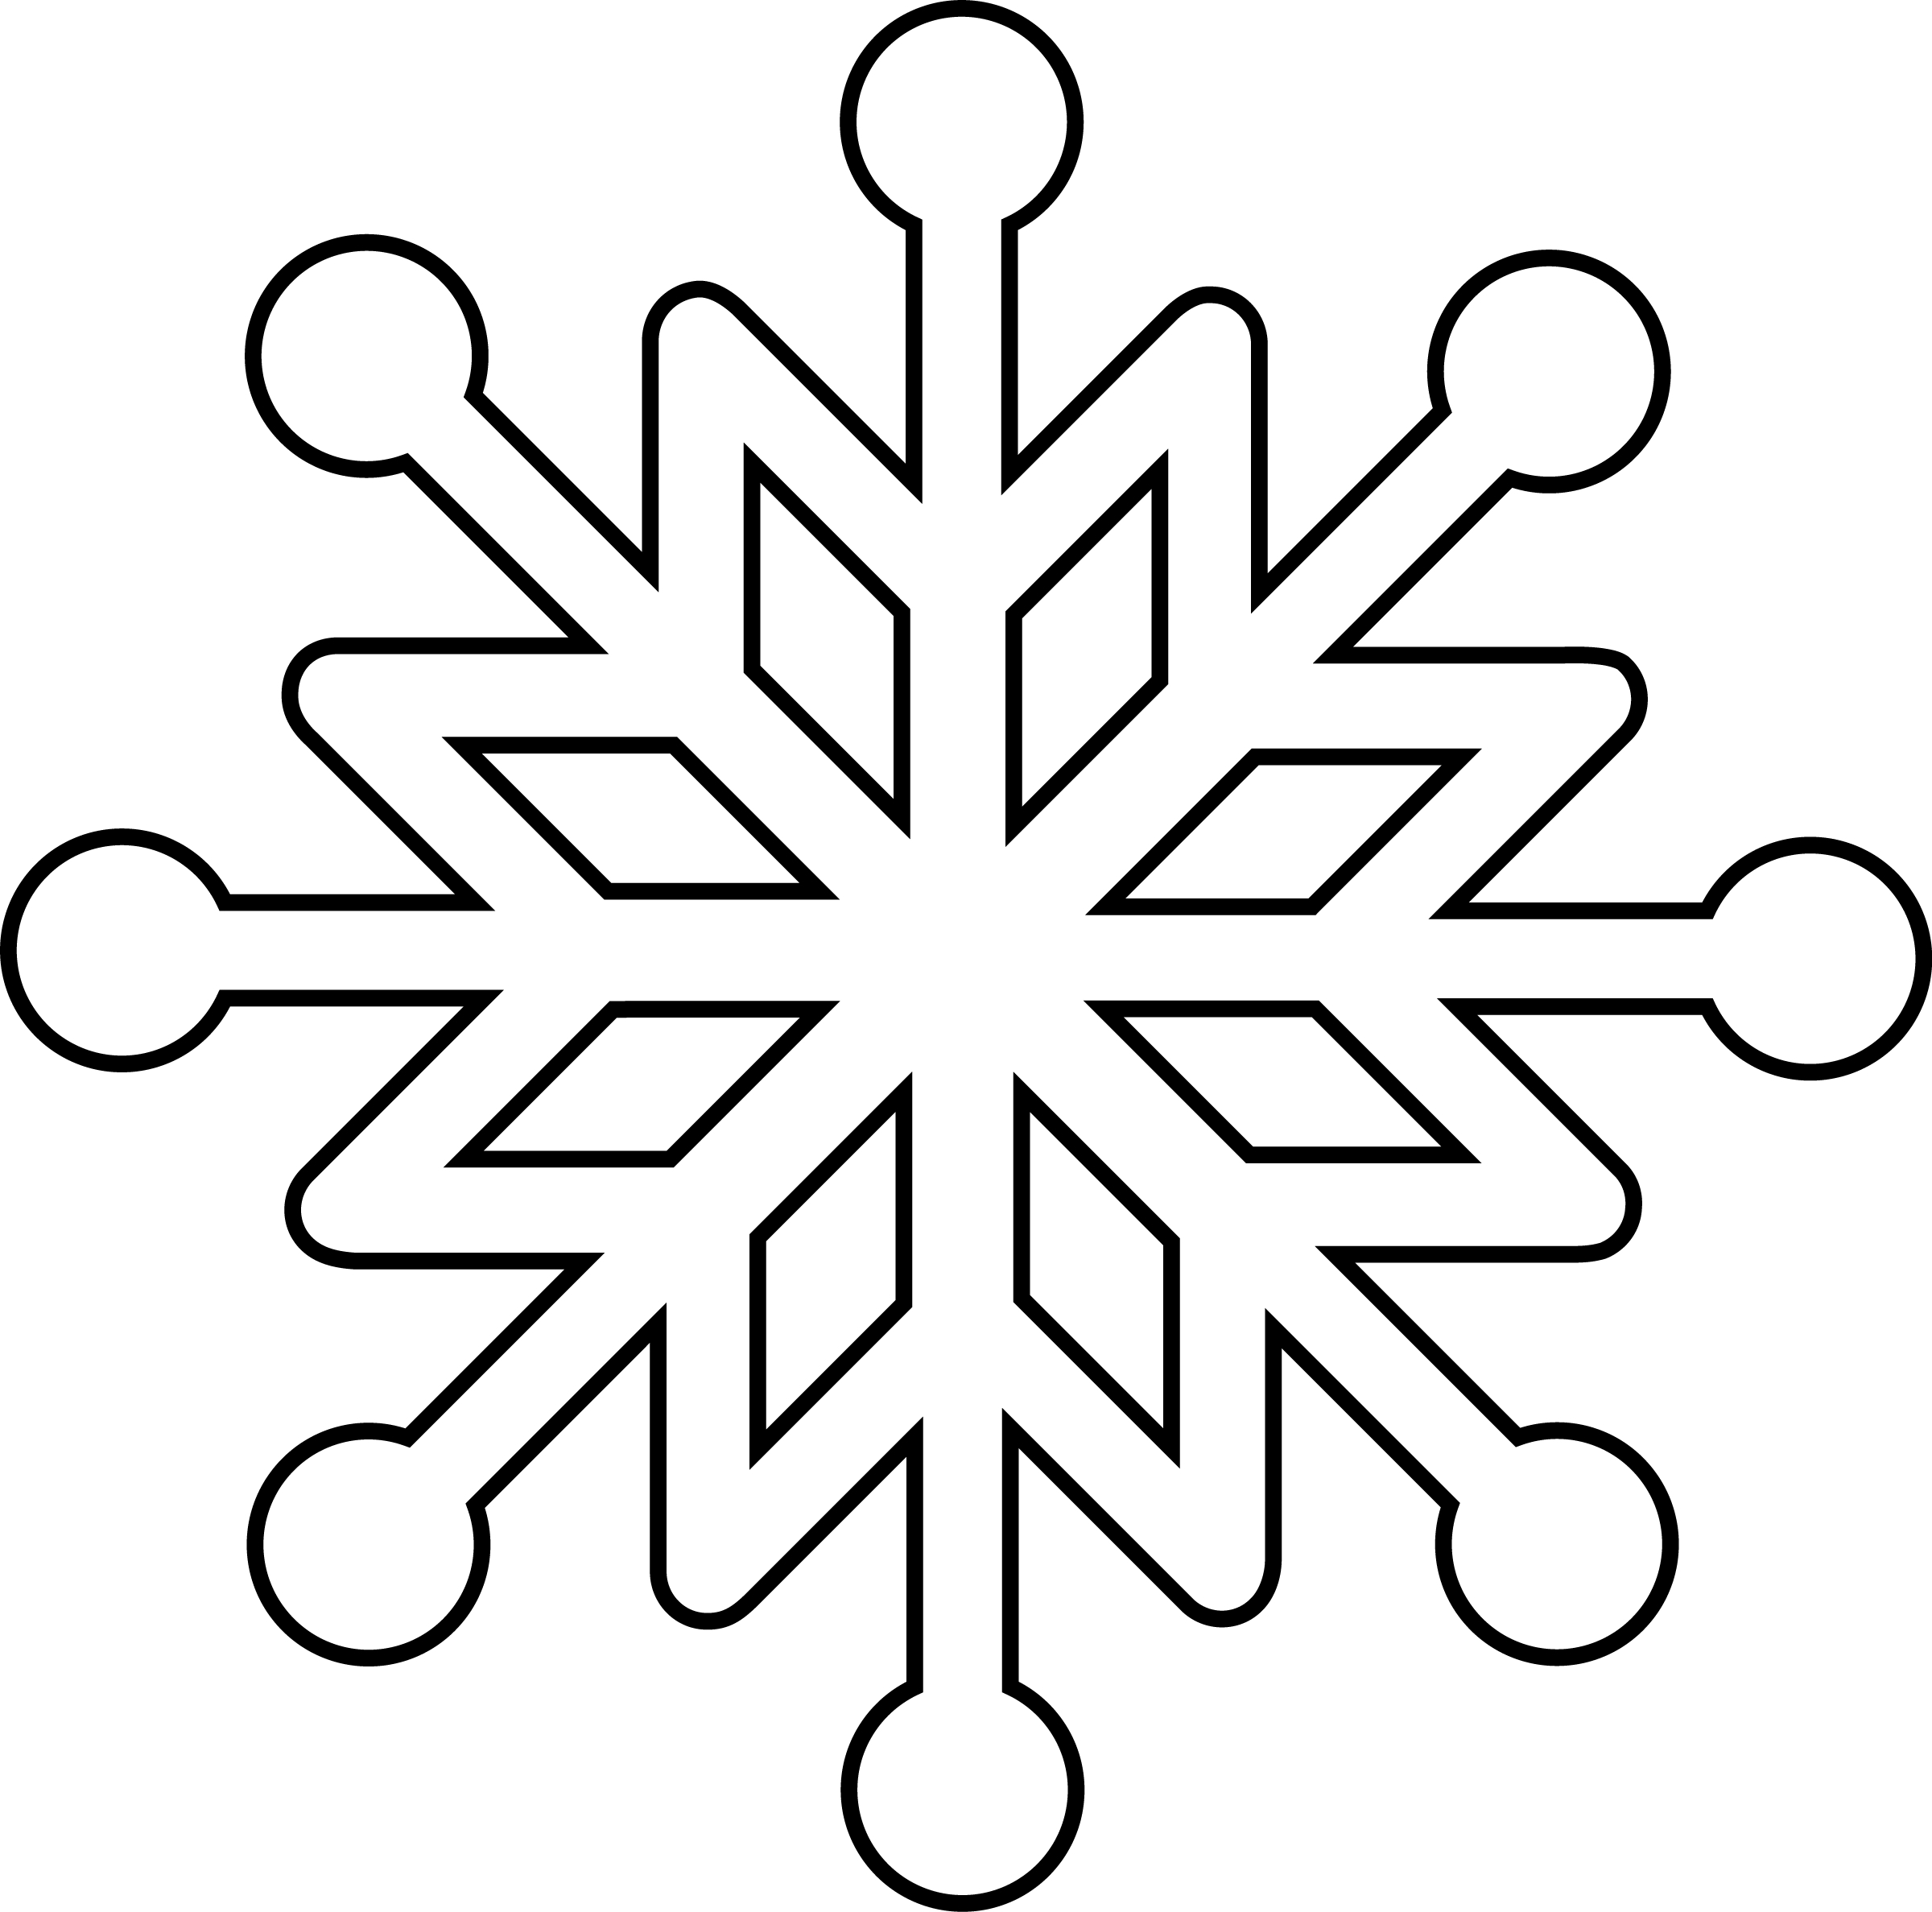 2400x2375 Draw A Cartoon Snowflake Simple Drawing Of A Snowflake Snowflake